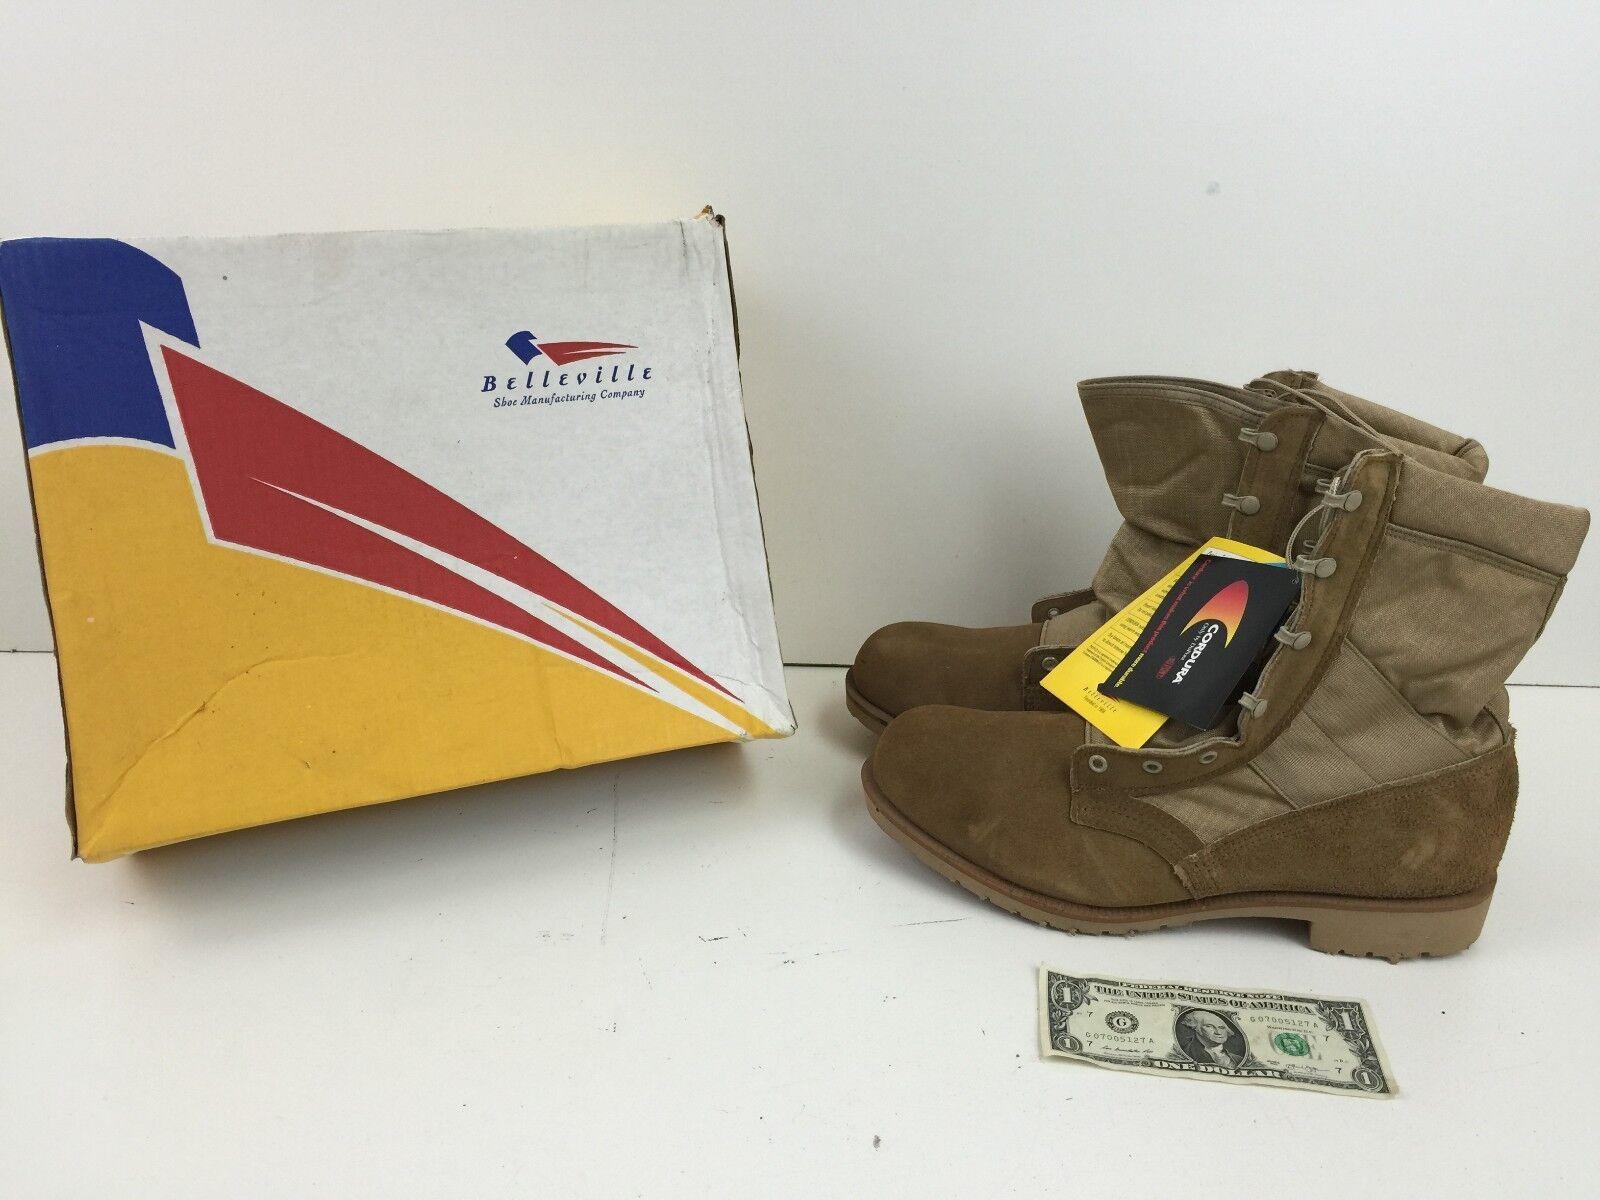 Belleville Steel Toe Hot Weather Boot Style: Desert Size 12.0 W - 200 Des ST